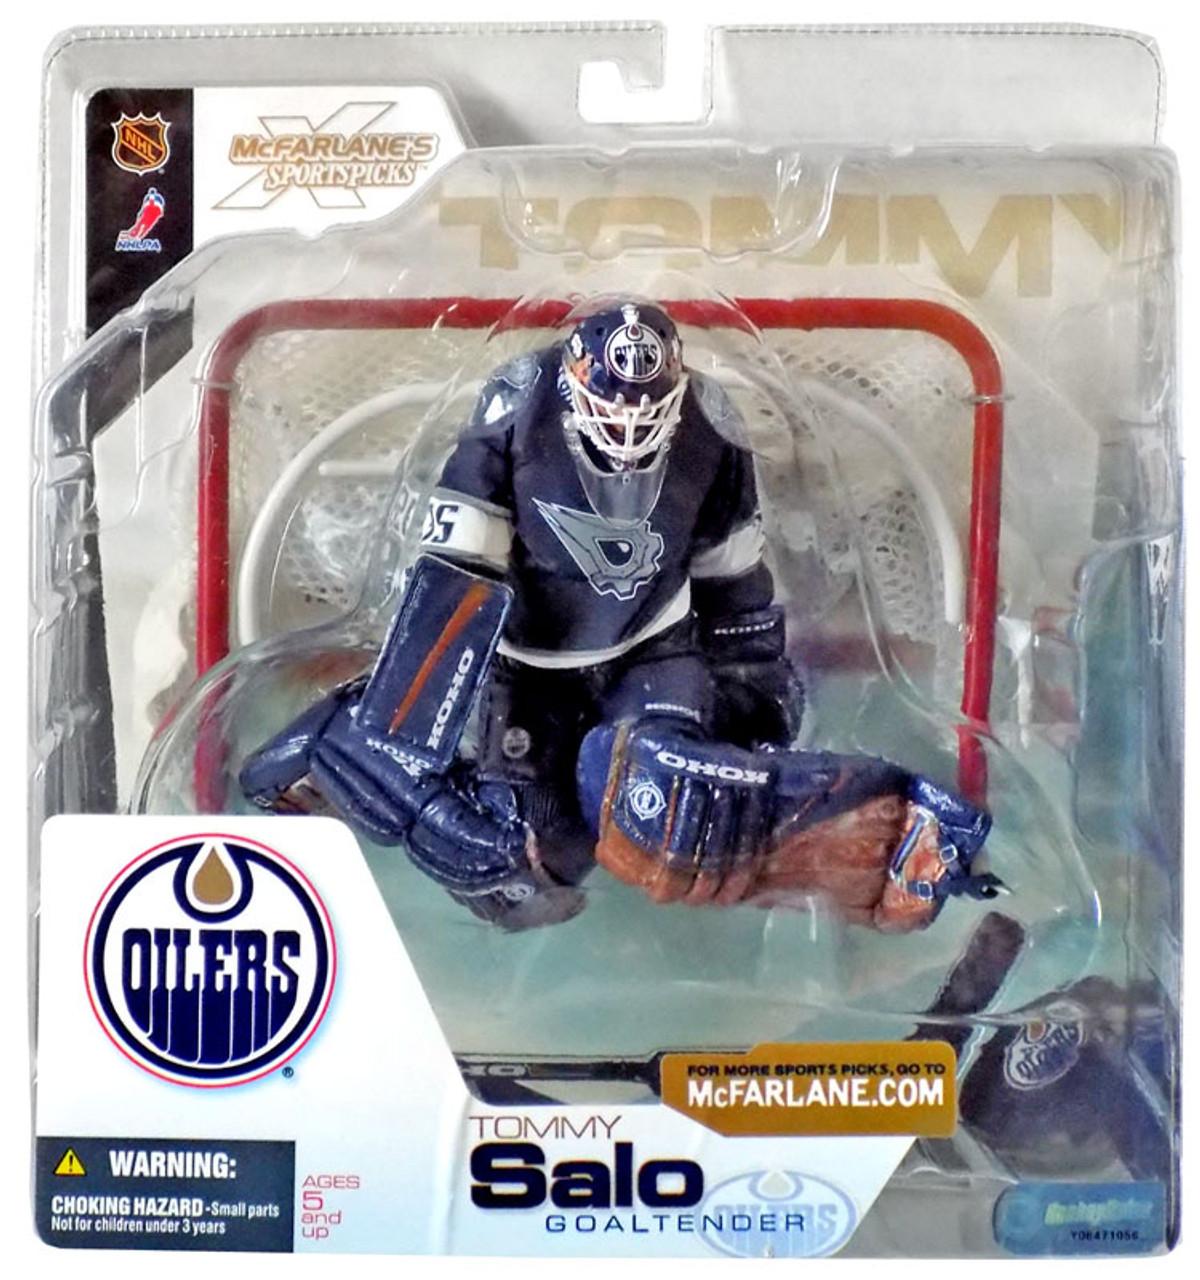 McFarlane Toys NHL Edmonton Oilers Sports Picks Series 4 Tommy Salo Action Figure [Blue Jersey]